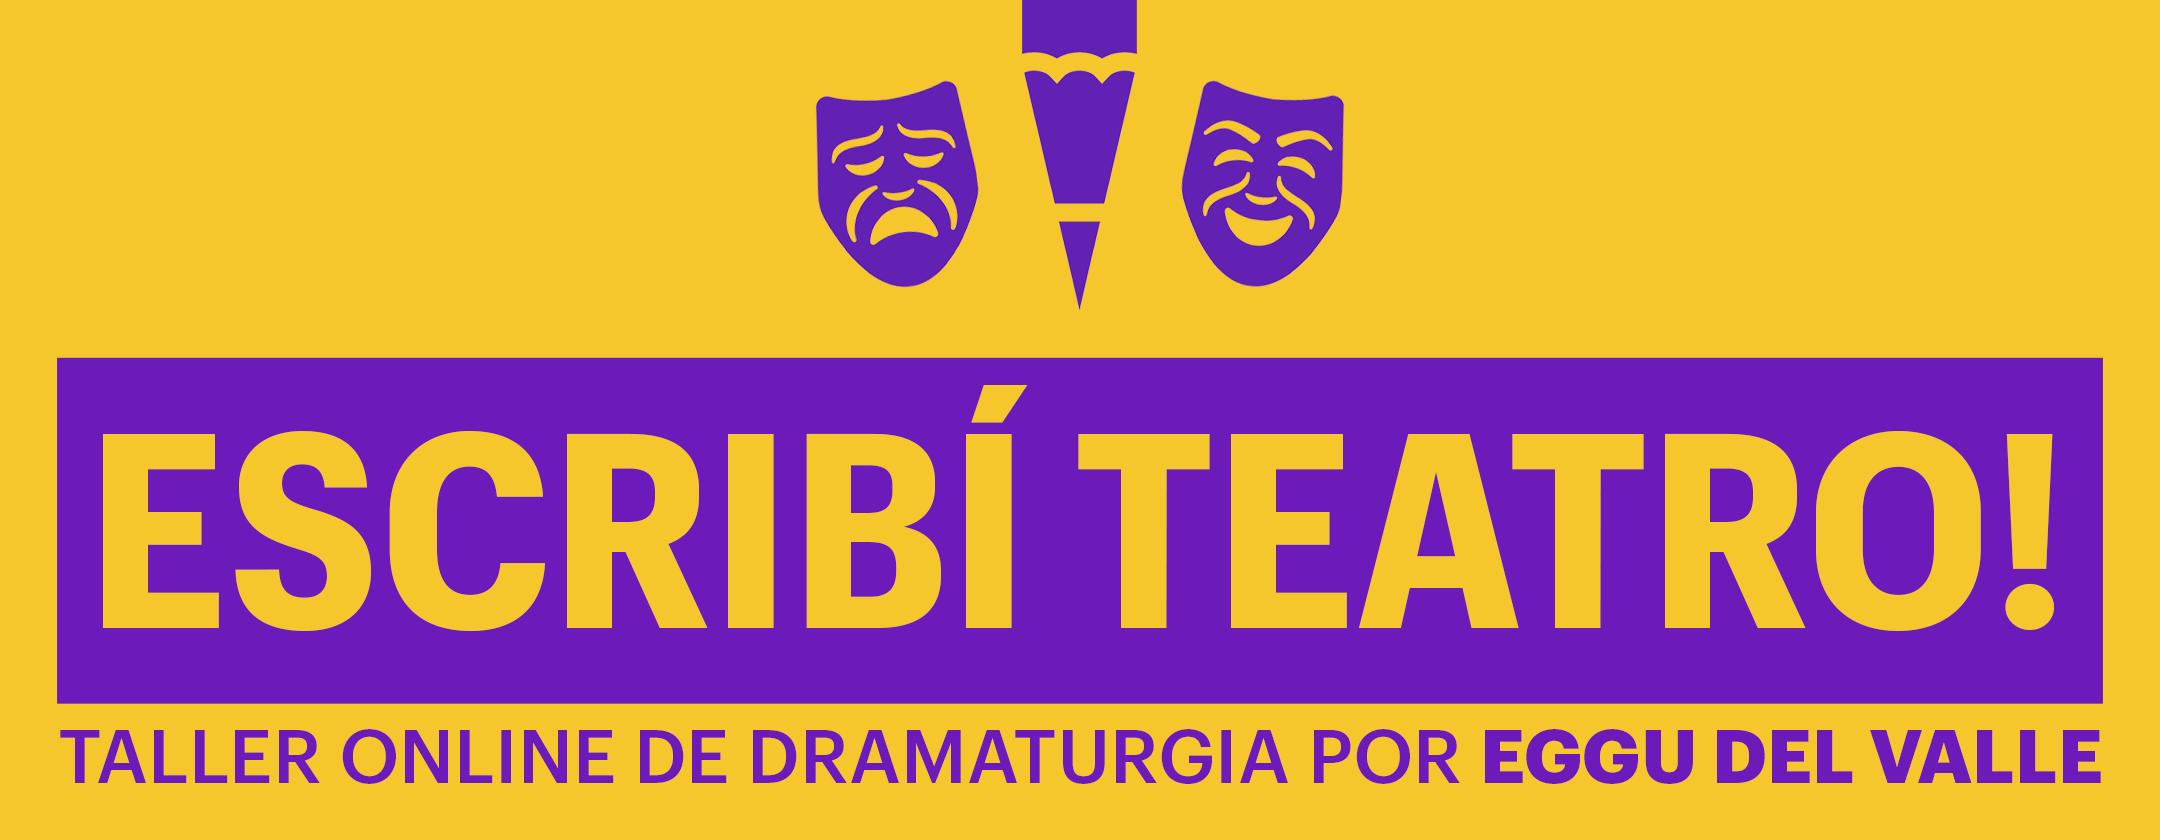 Escribí Teatro! Taller Online de Dramaturgia